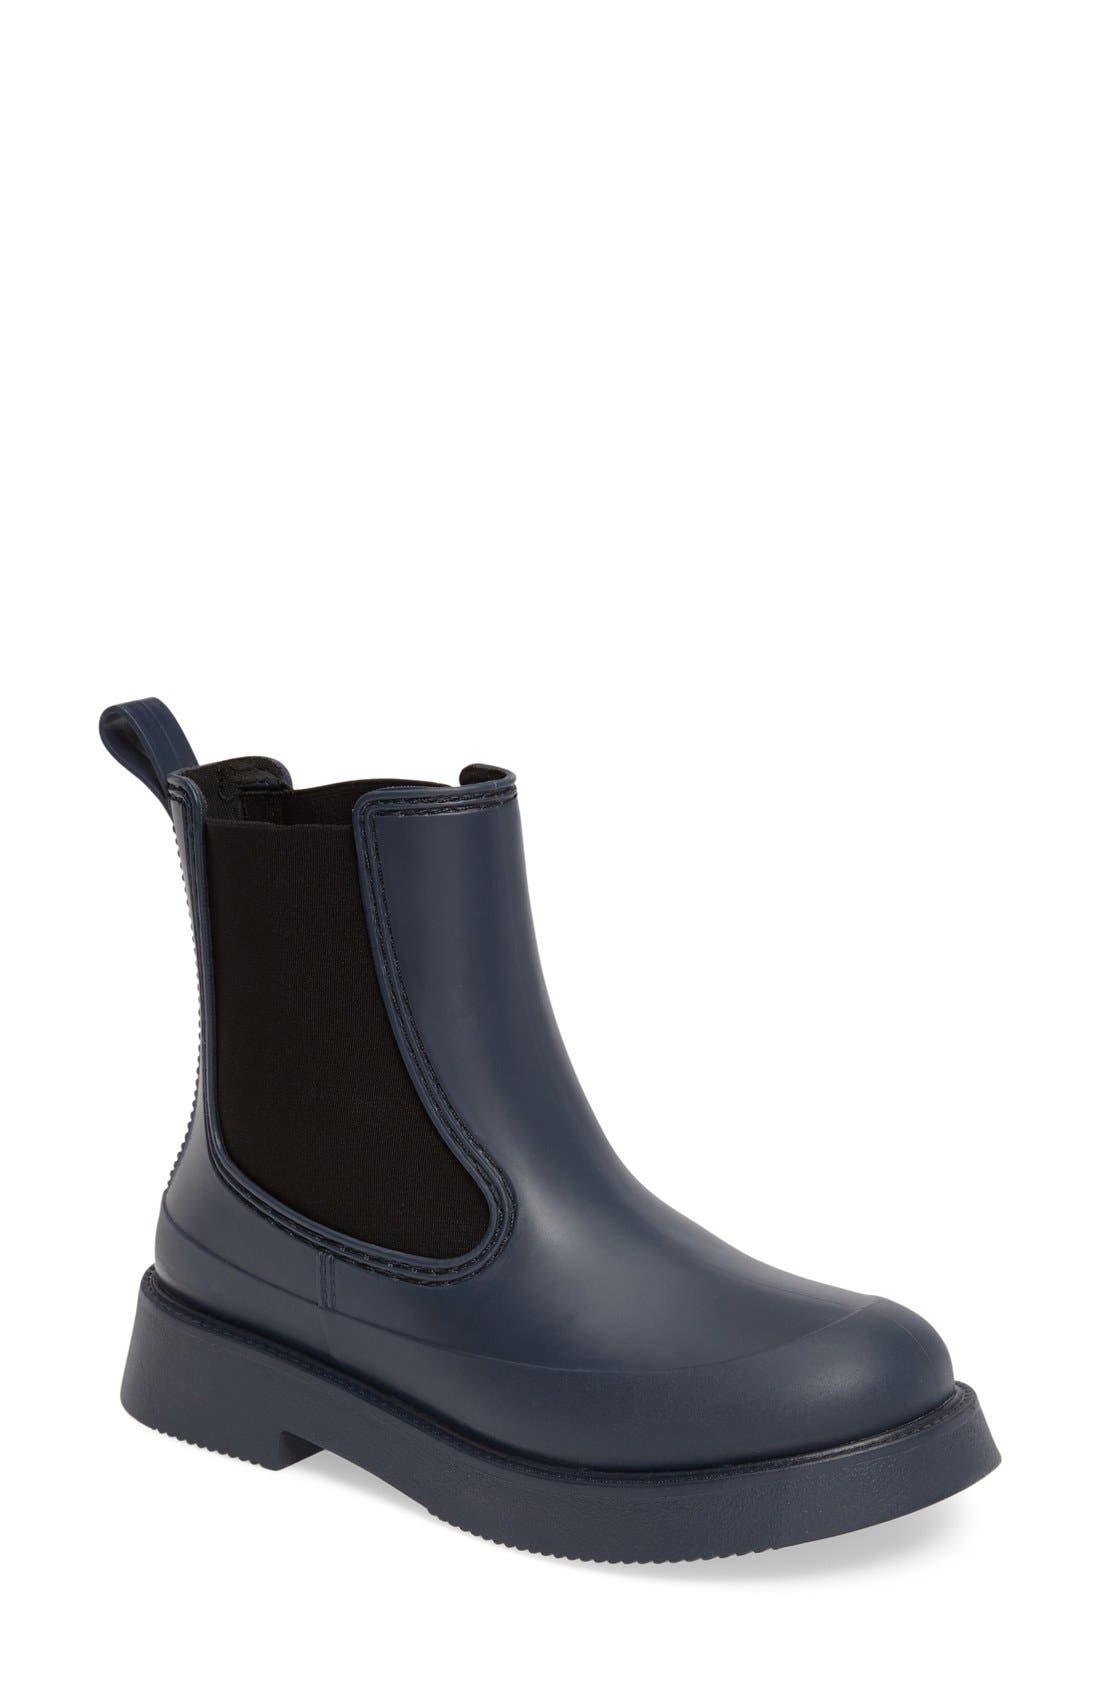 Alternate Image 1 Selected - Jeffrey Campbell El Nino Chelsea Rain Boot (Women)